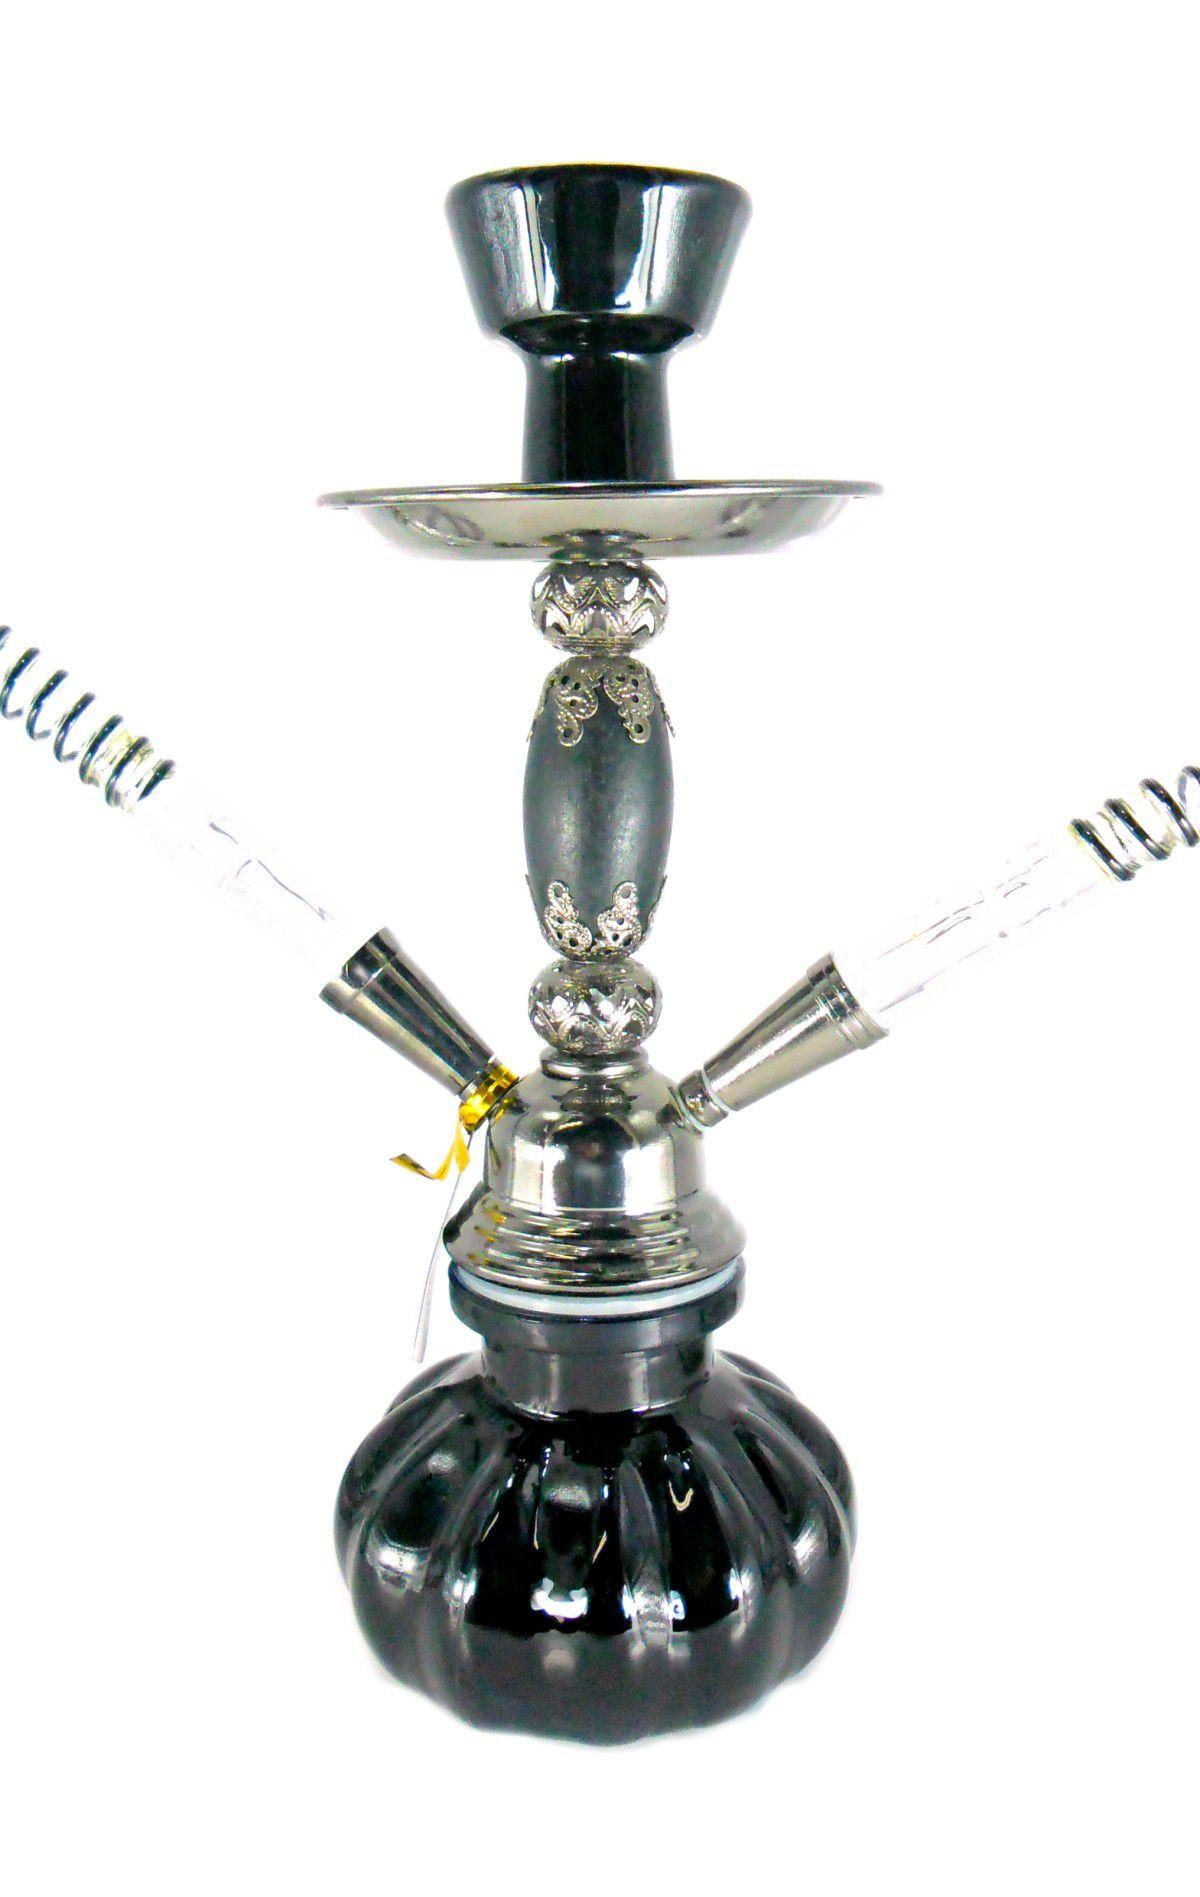 Narguile MOON compacto (29cm), duas mangueiras, vaso vidro PRETO, corpo PRETO METÁLICO. AT7144PRT